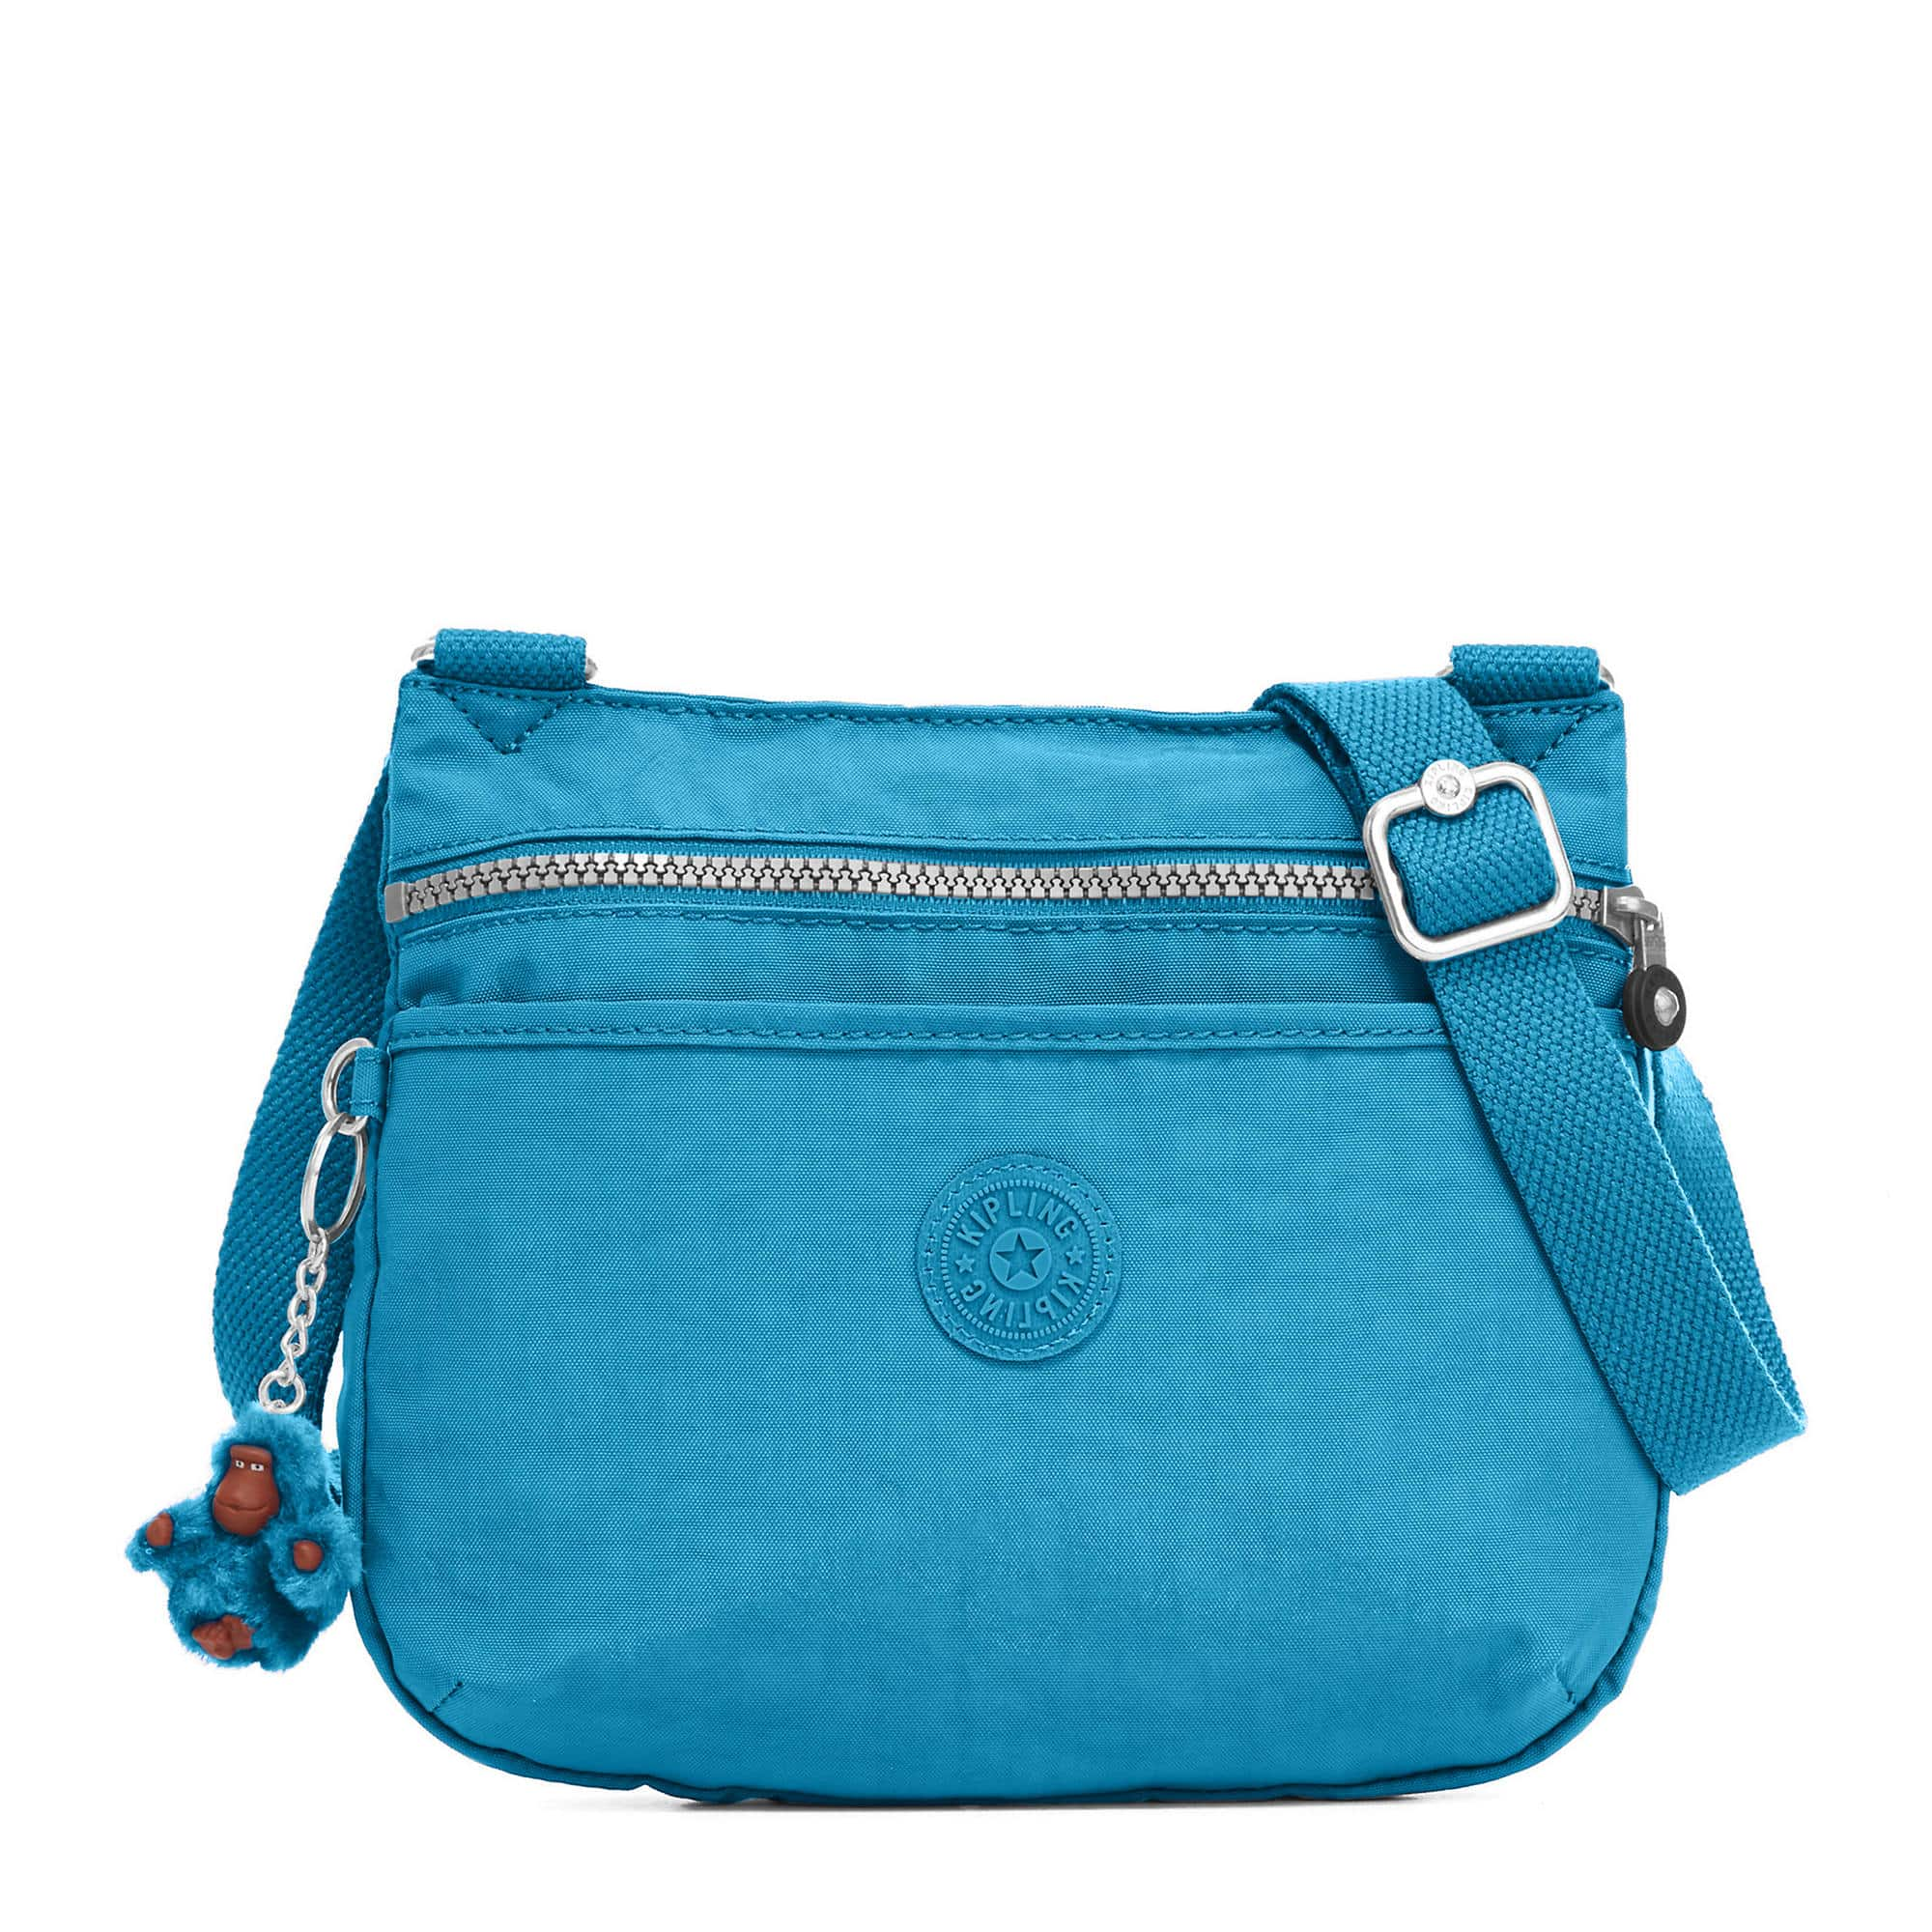 Kipling Emmylou Crossbody Bag - $13.99 + FS